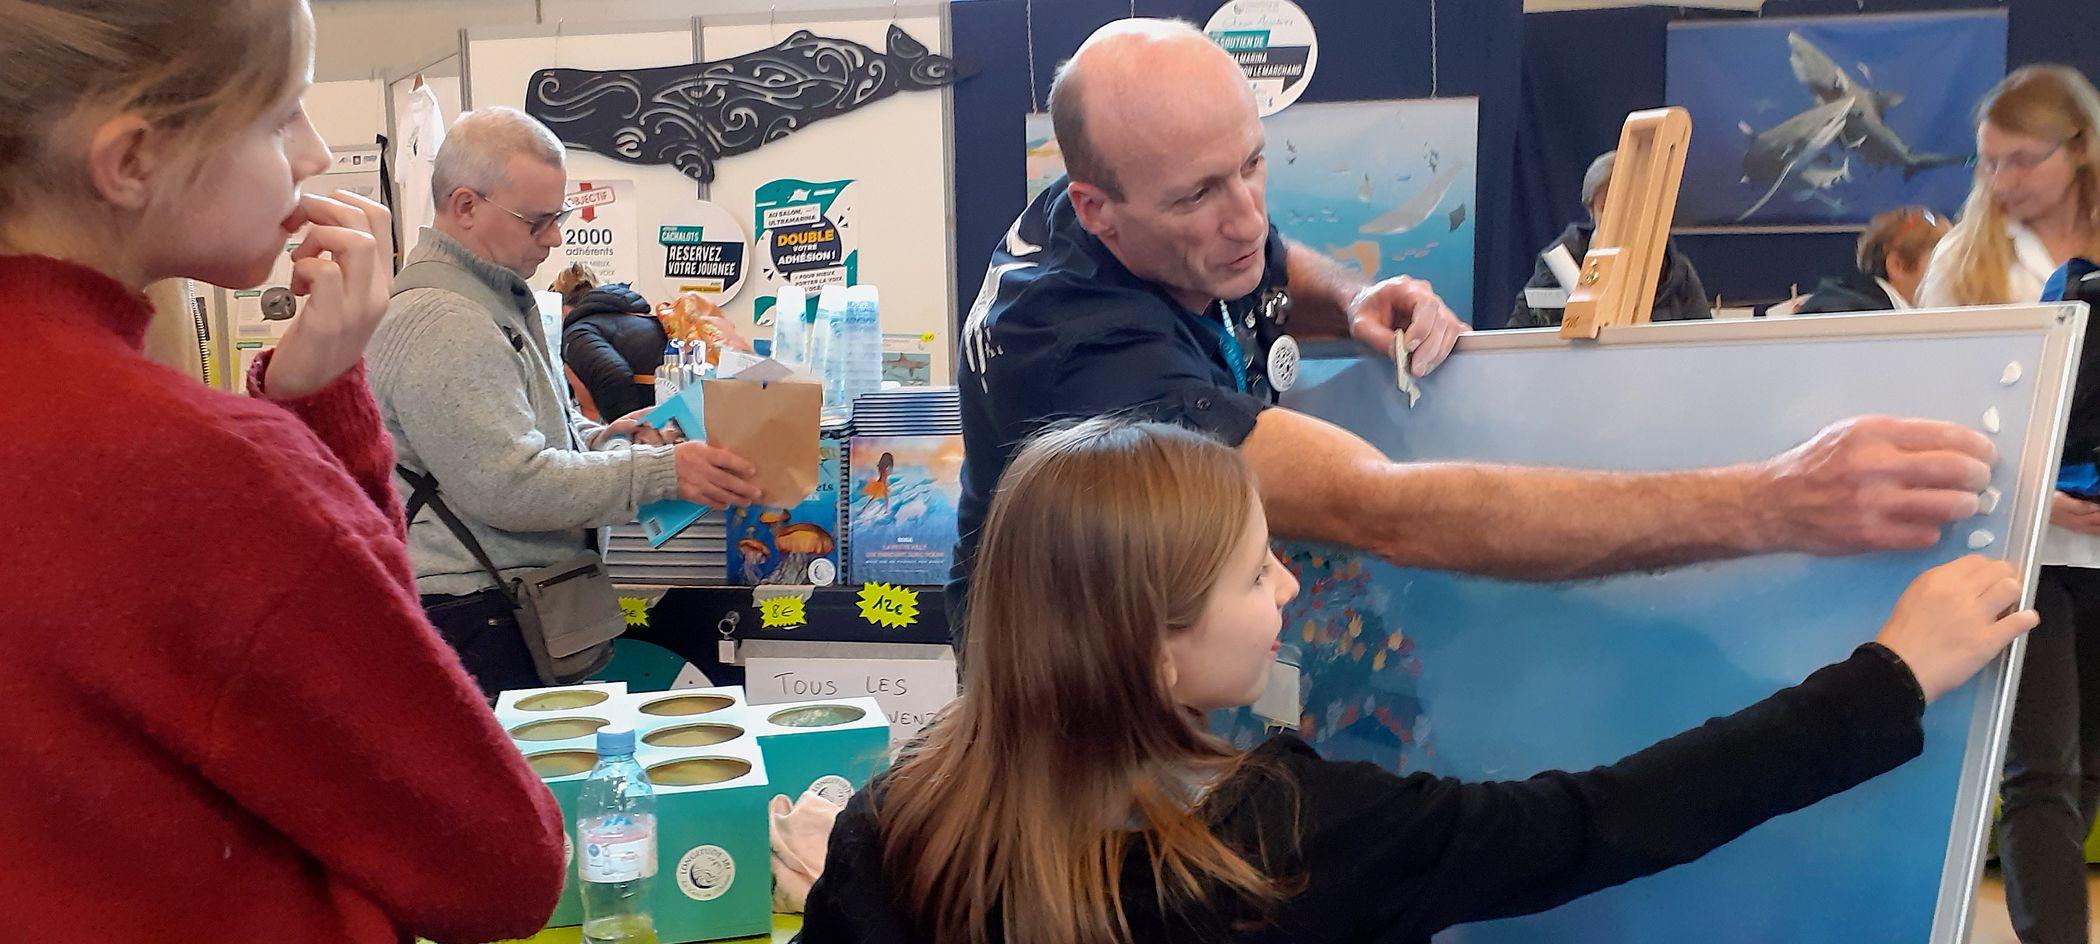 Animation Ocean academy par Patrice Bureau